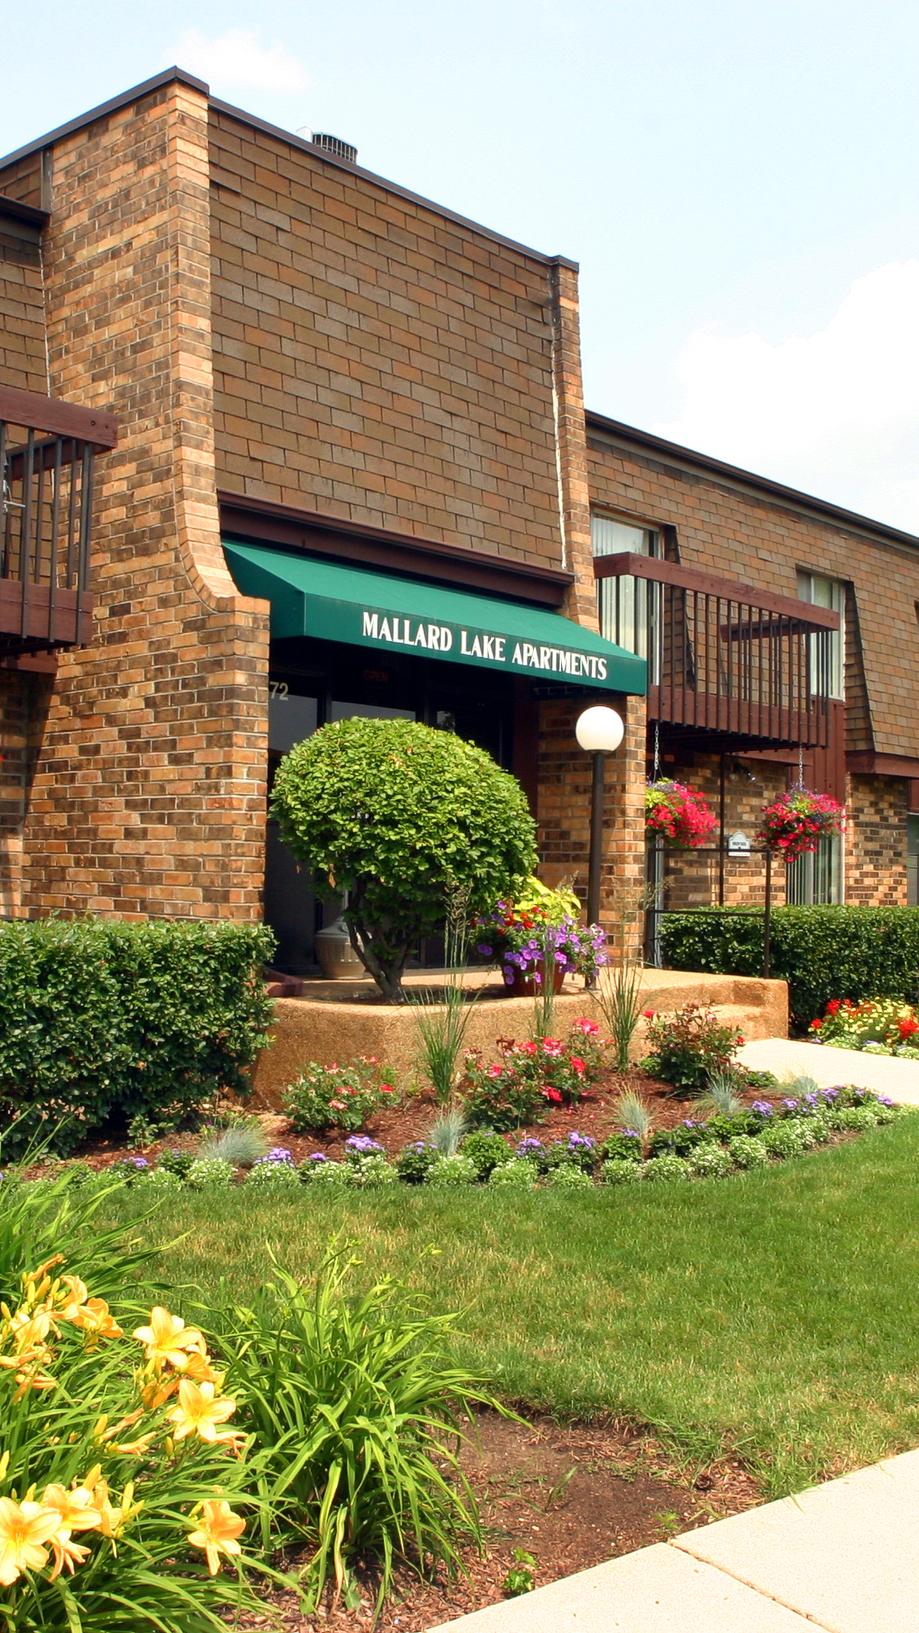 Mallard Lake Apartments in Wheeling, IL